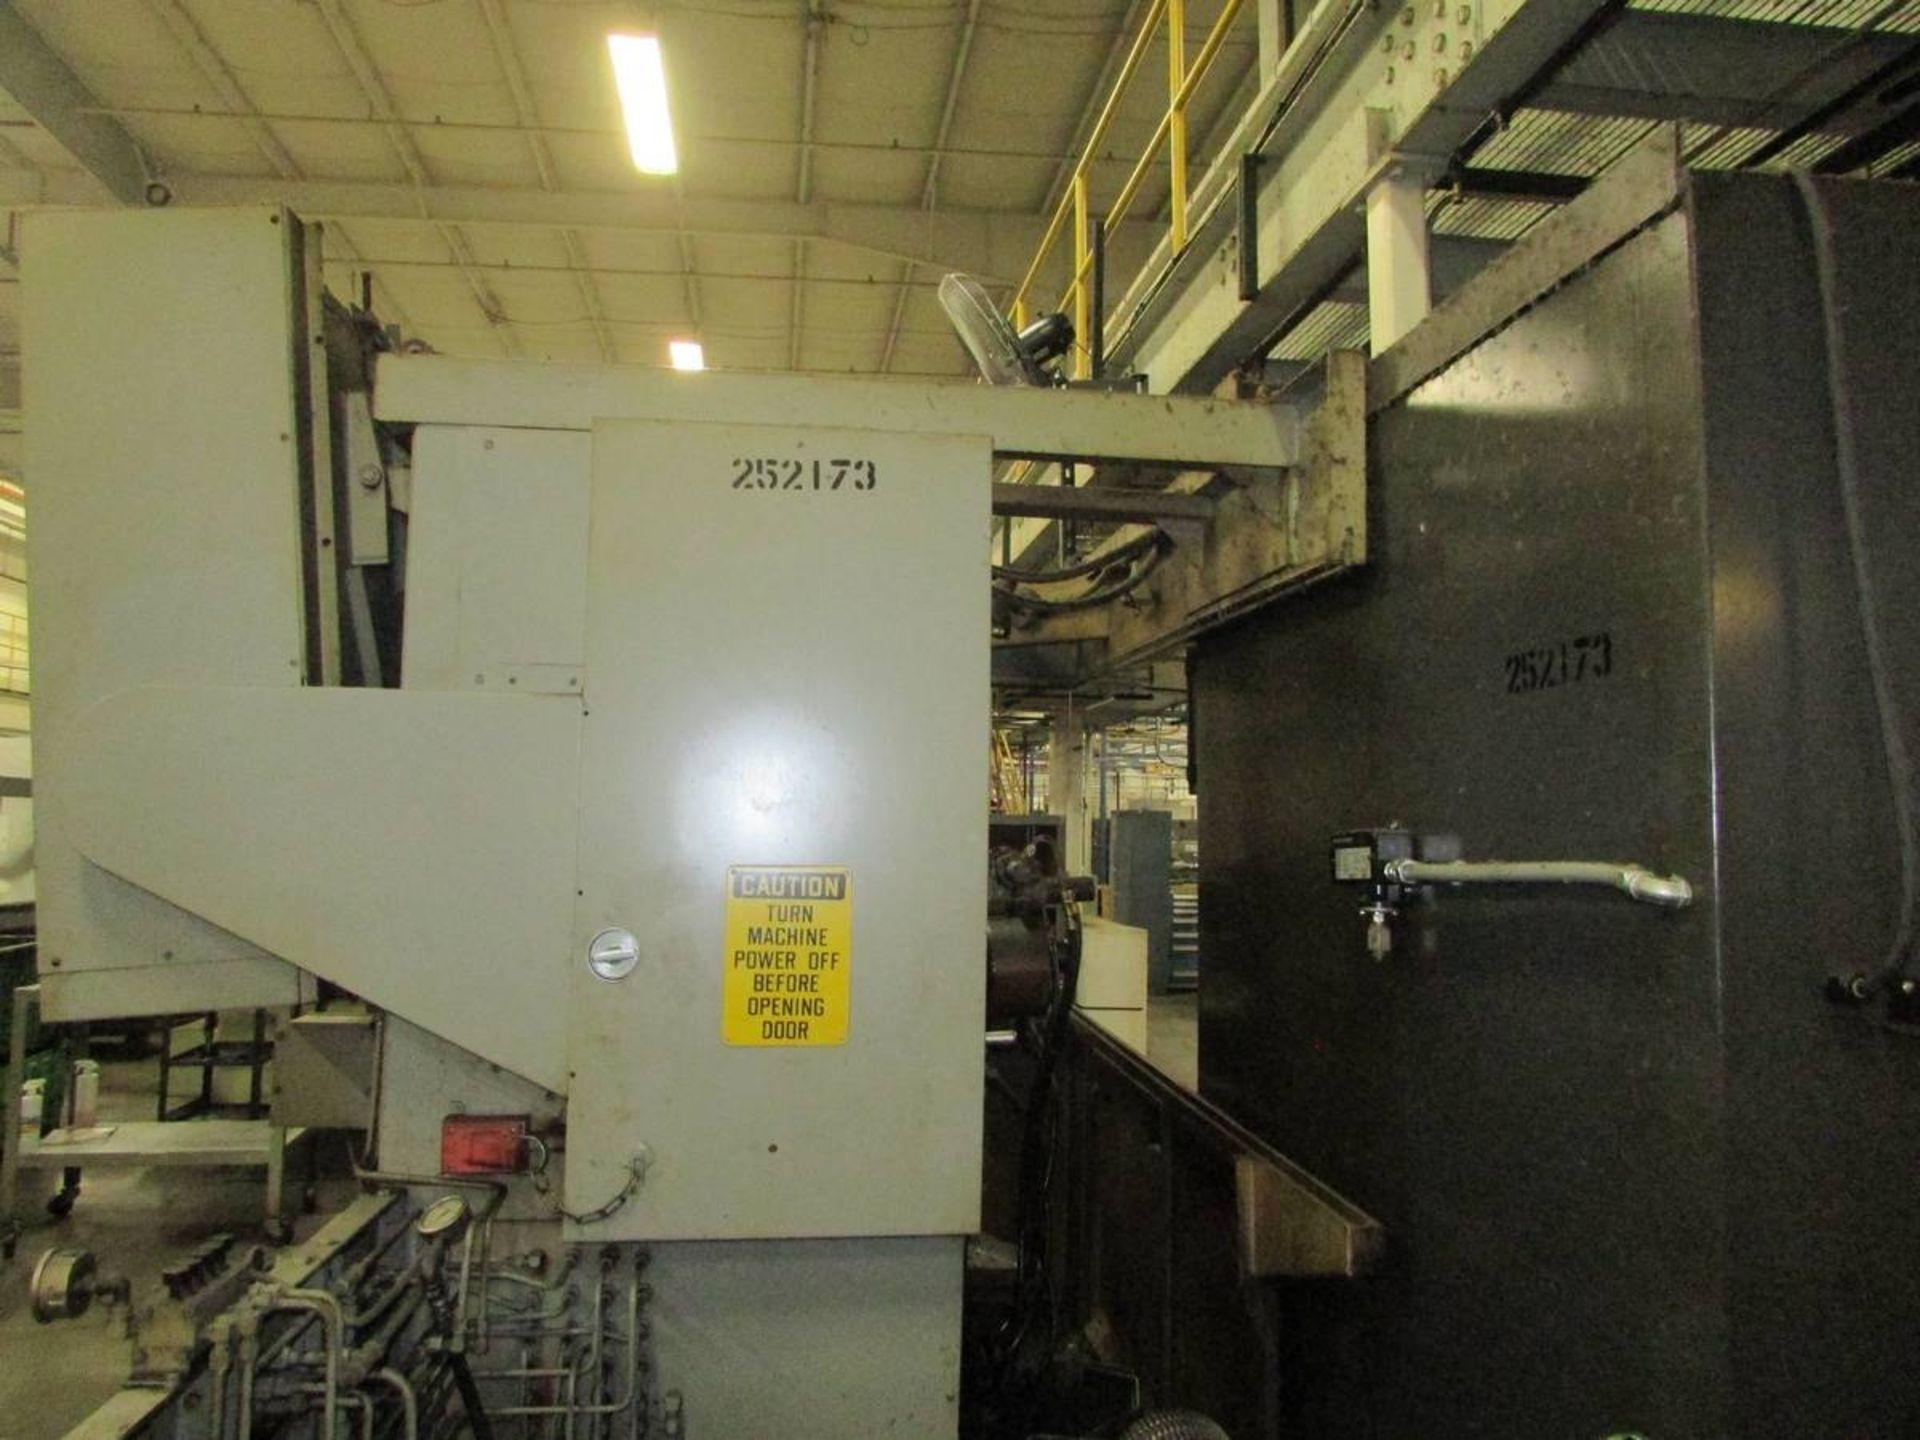 Cleveland/ Waterbury Farrel CR300-612-002 Universal CNC Gear Hobbing Machine - Image 15 of 19